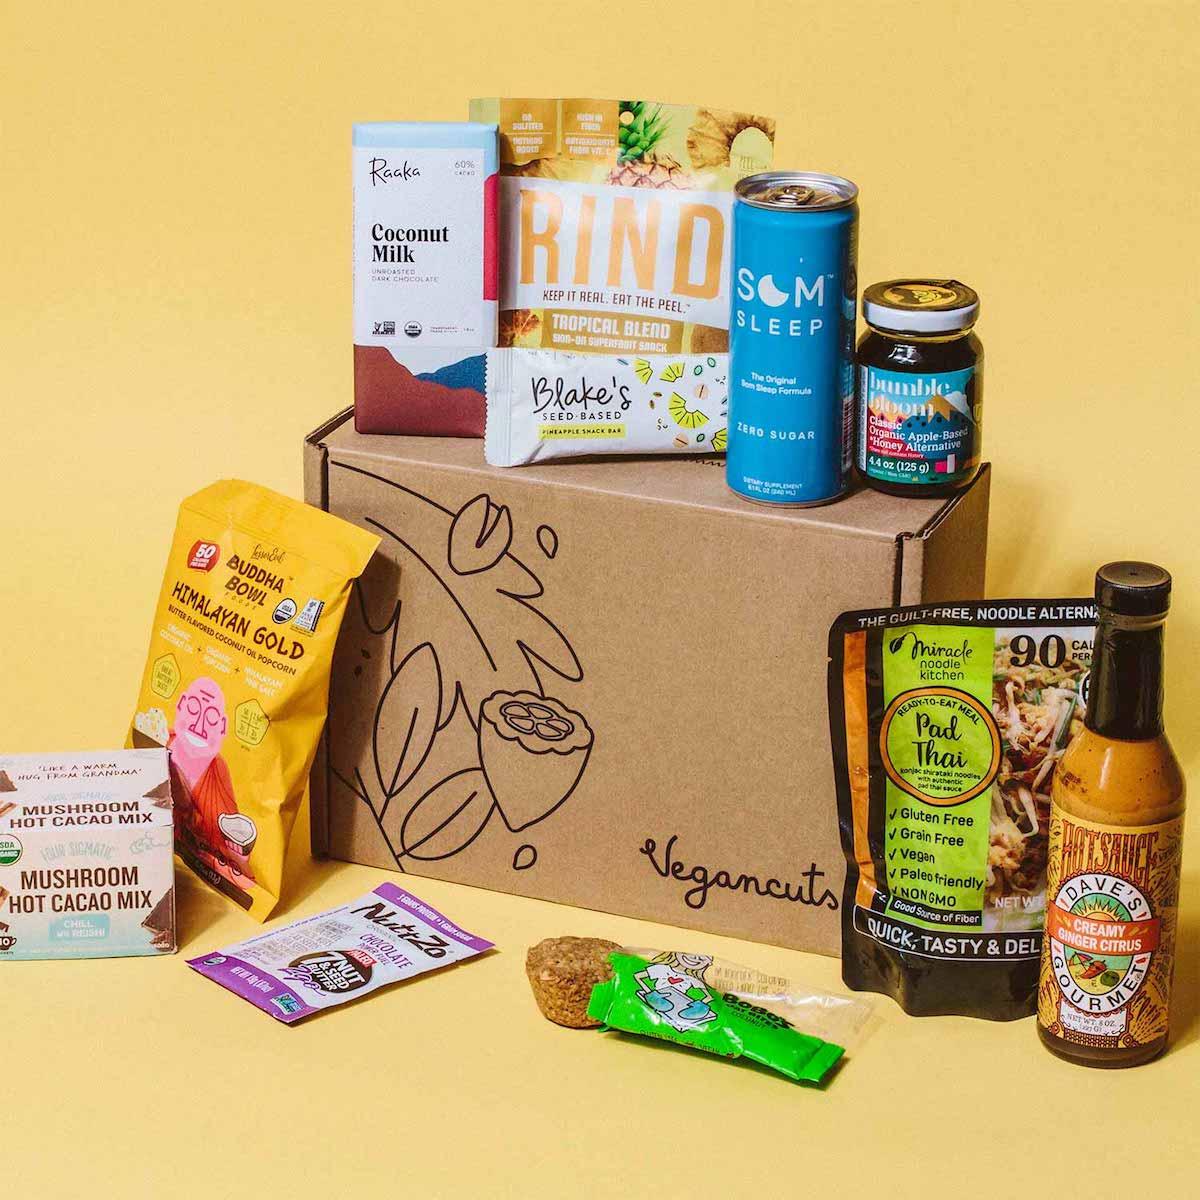 Several vegan snack items surrounding a cardboard box.